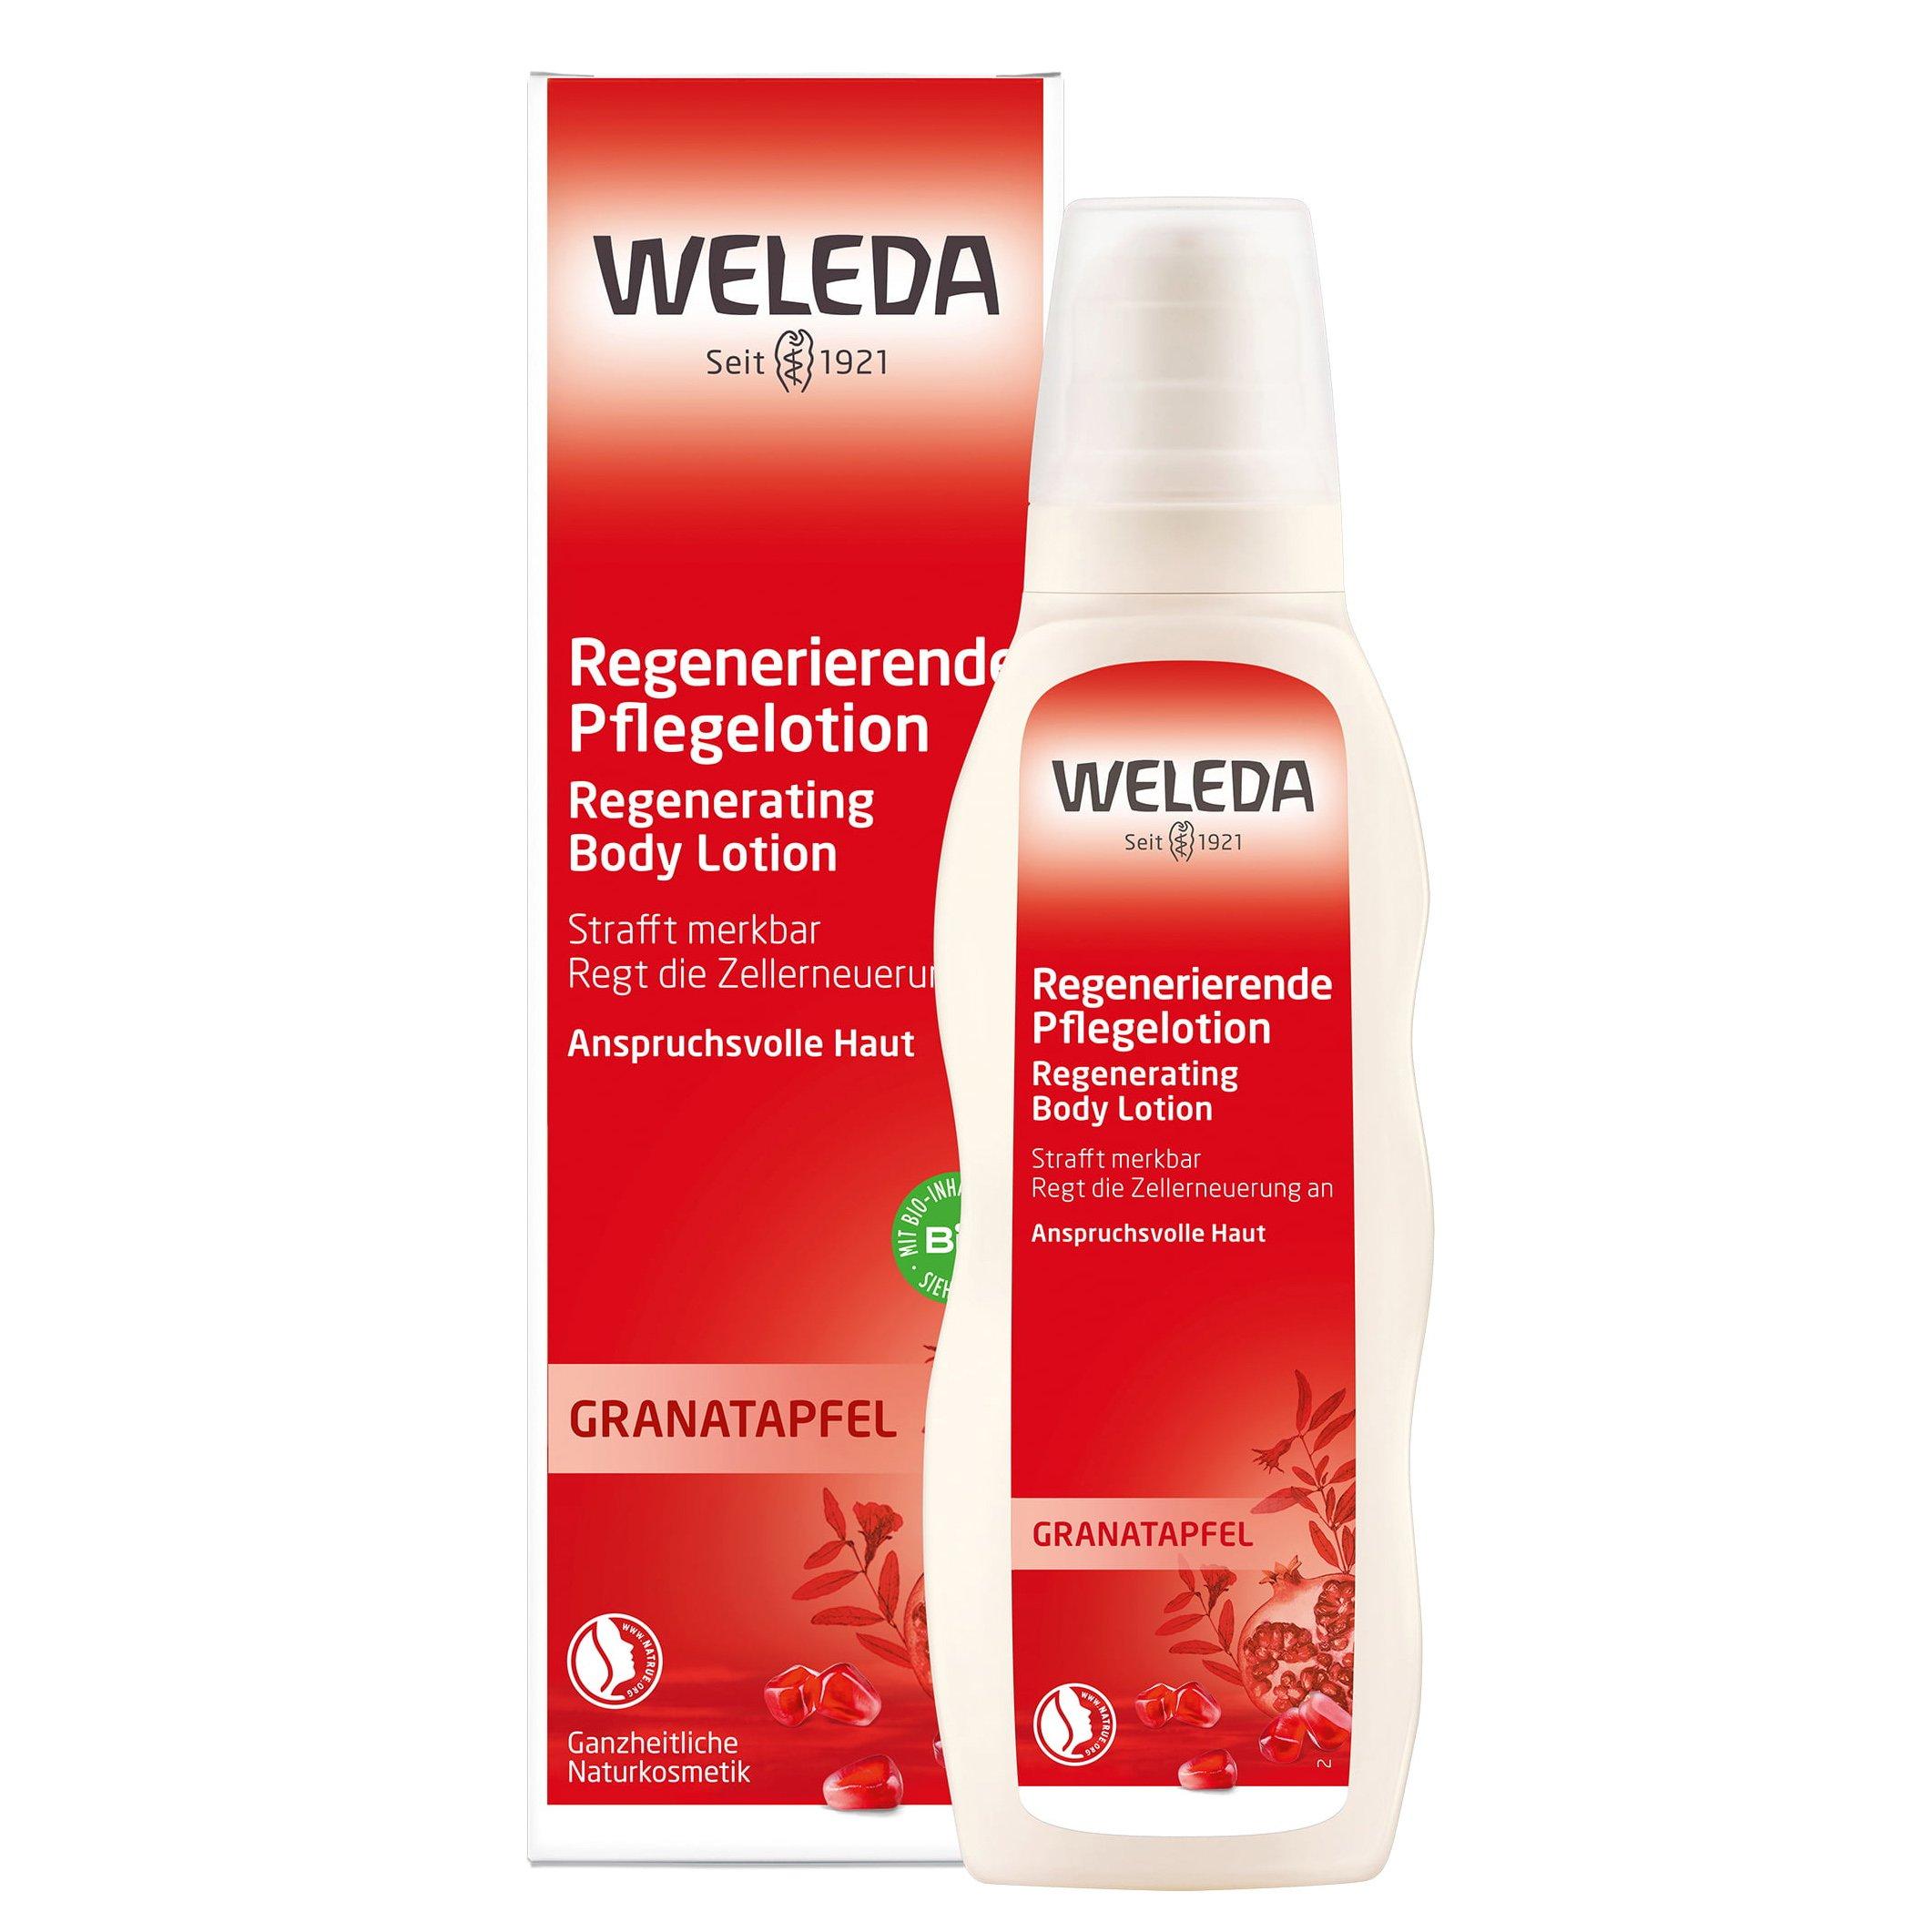 Weleda Pomegranate Regenerating Body Lotion Γαλάκτωμα Αναζωογόνησης με Ρόδι για την Πρόωρη Γήρανση της Επιδερμίδας 200ml